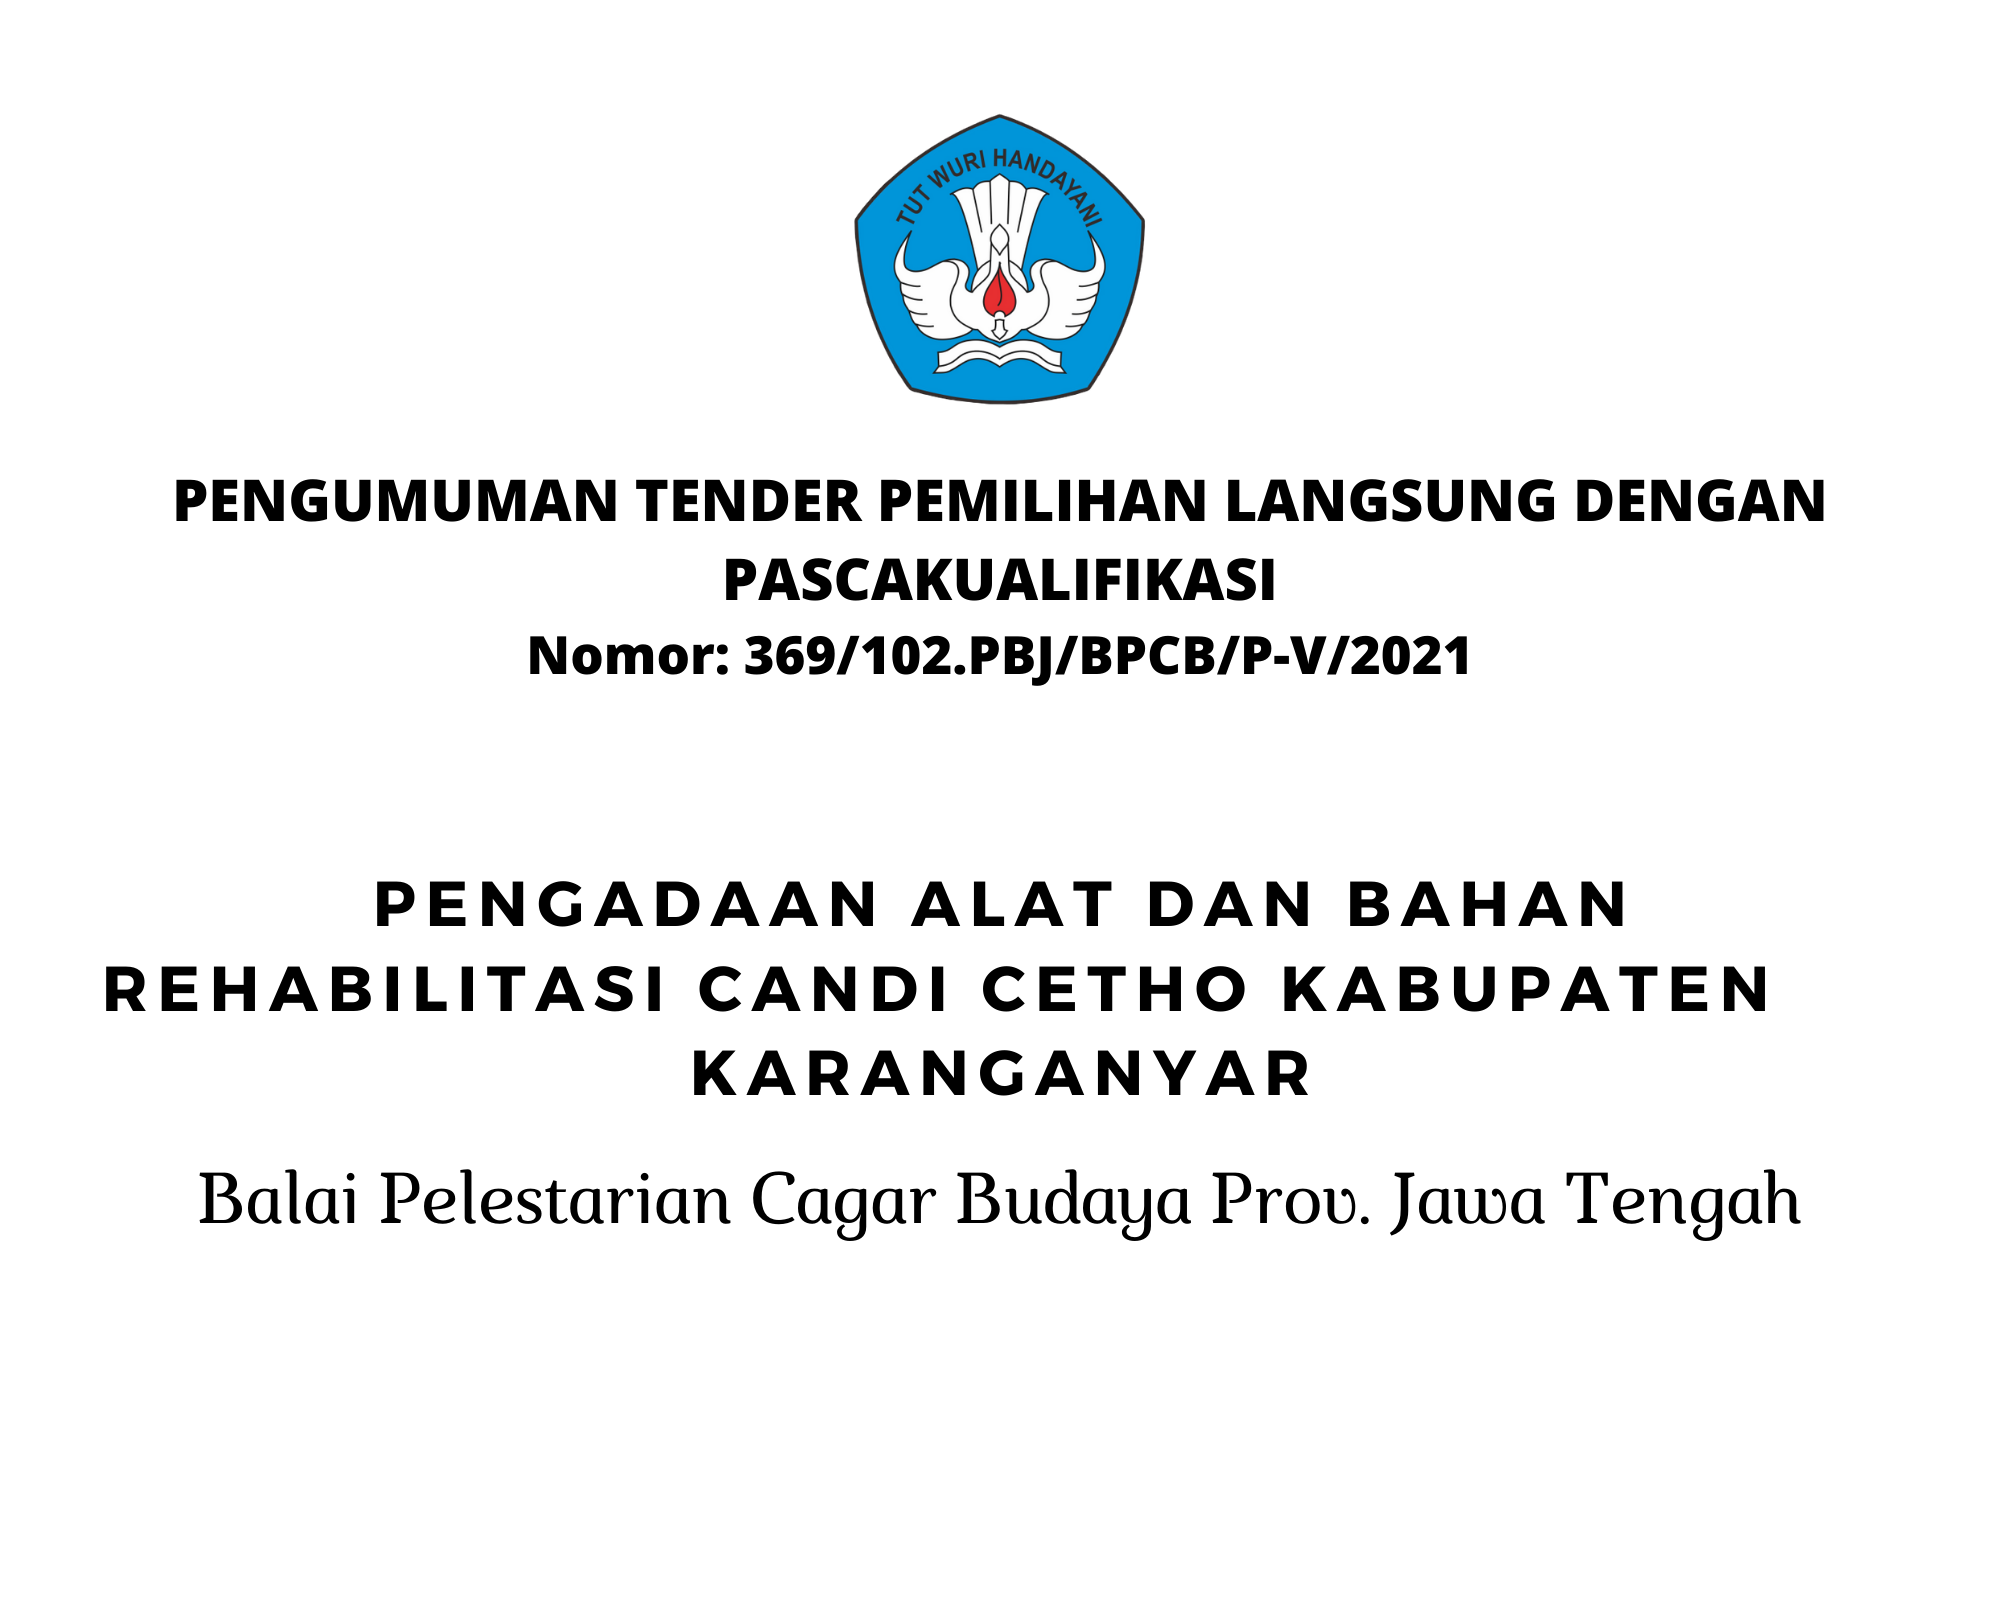 Read more about the article Pengadaan Alat Dan Bahan Rehabilitasi Candi Cetho Kabupaten Karanganyar